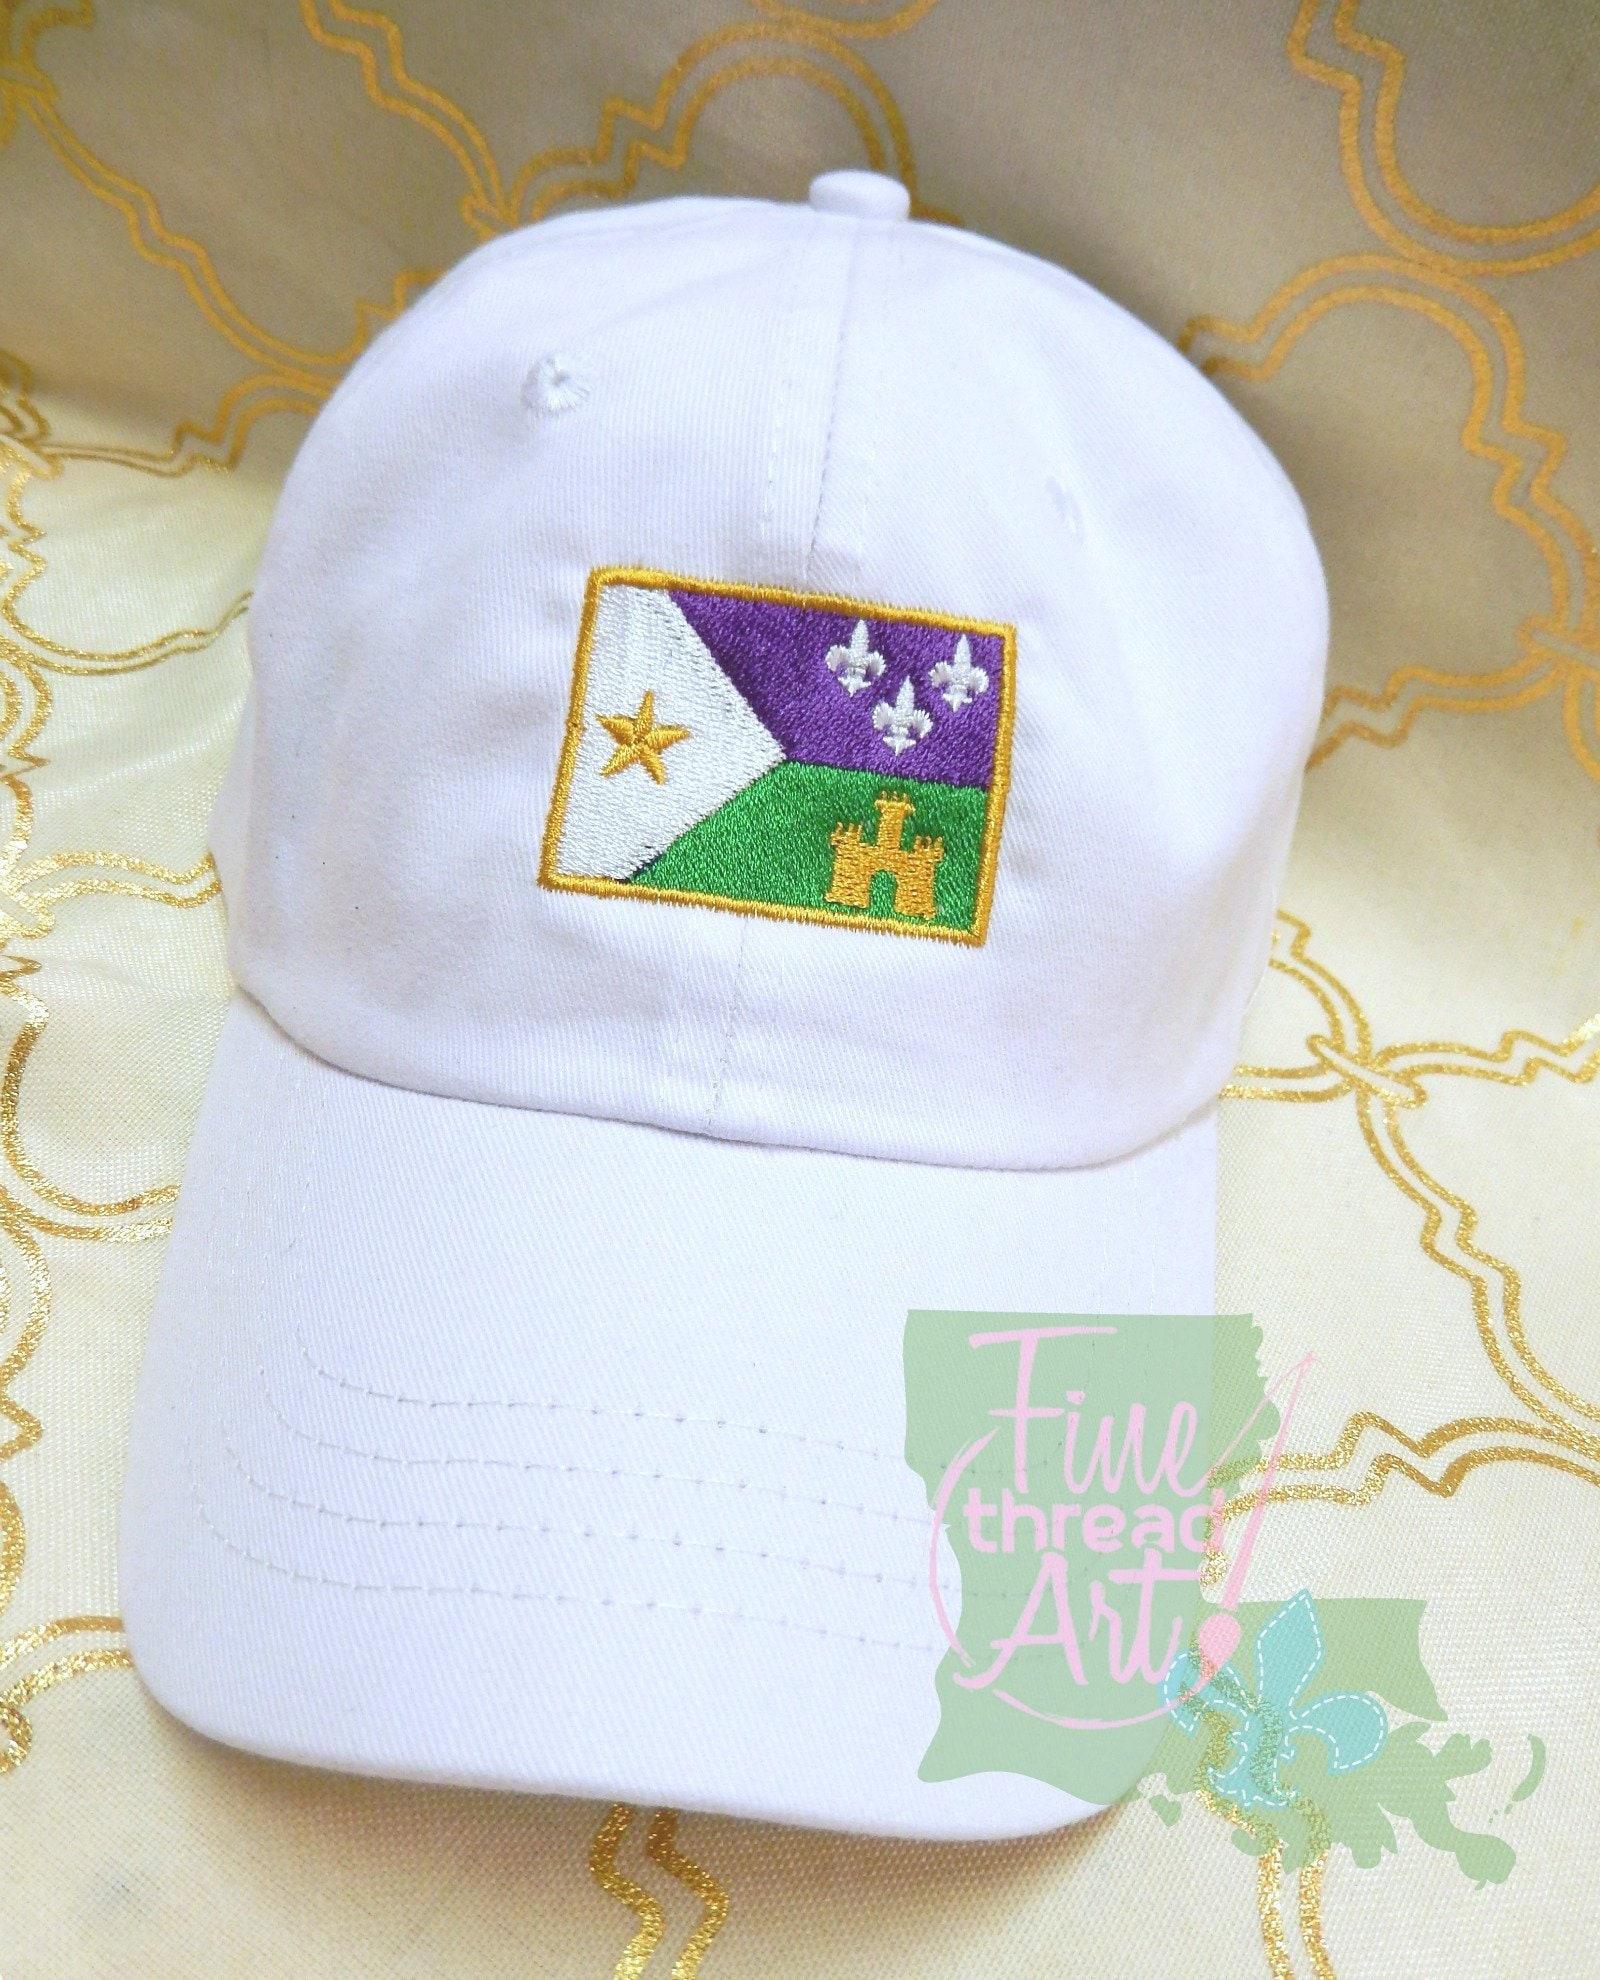 13a4fdea39757 Adult or Kids Mardi Gras Acadian Flag Baseball Cap Hat LEATHER ...